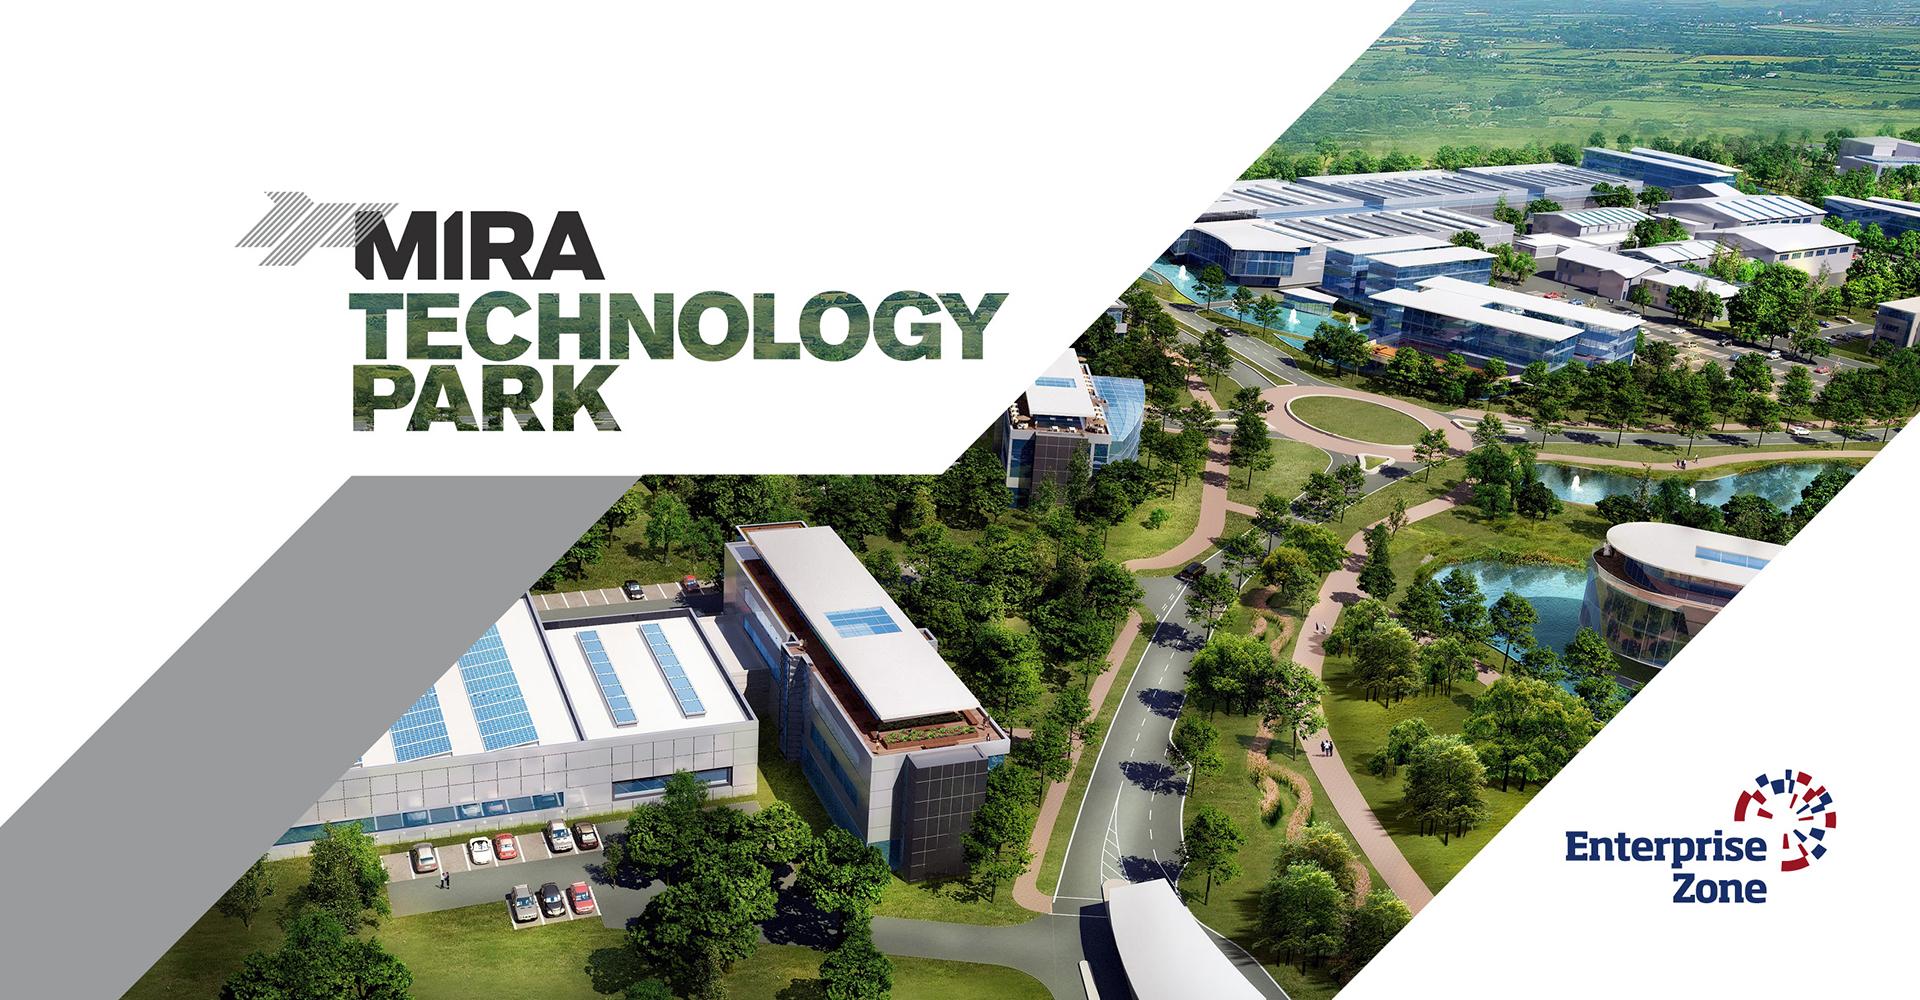 MIRA TECHNOLOGY PARK - 7